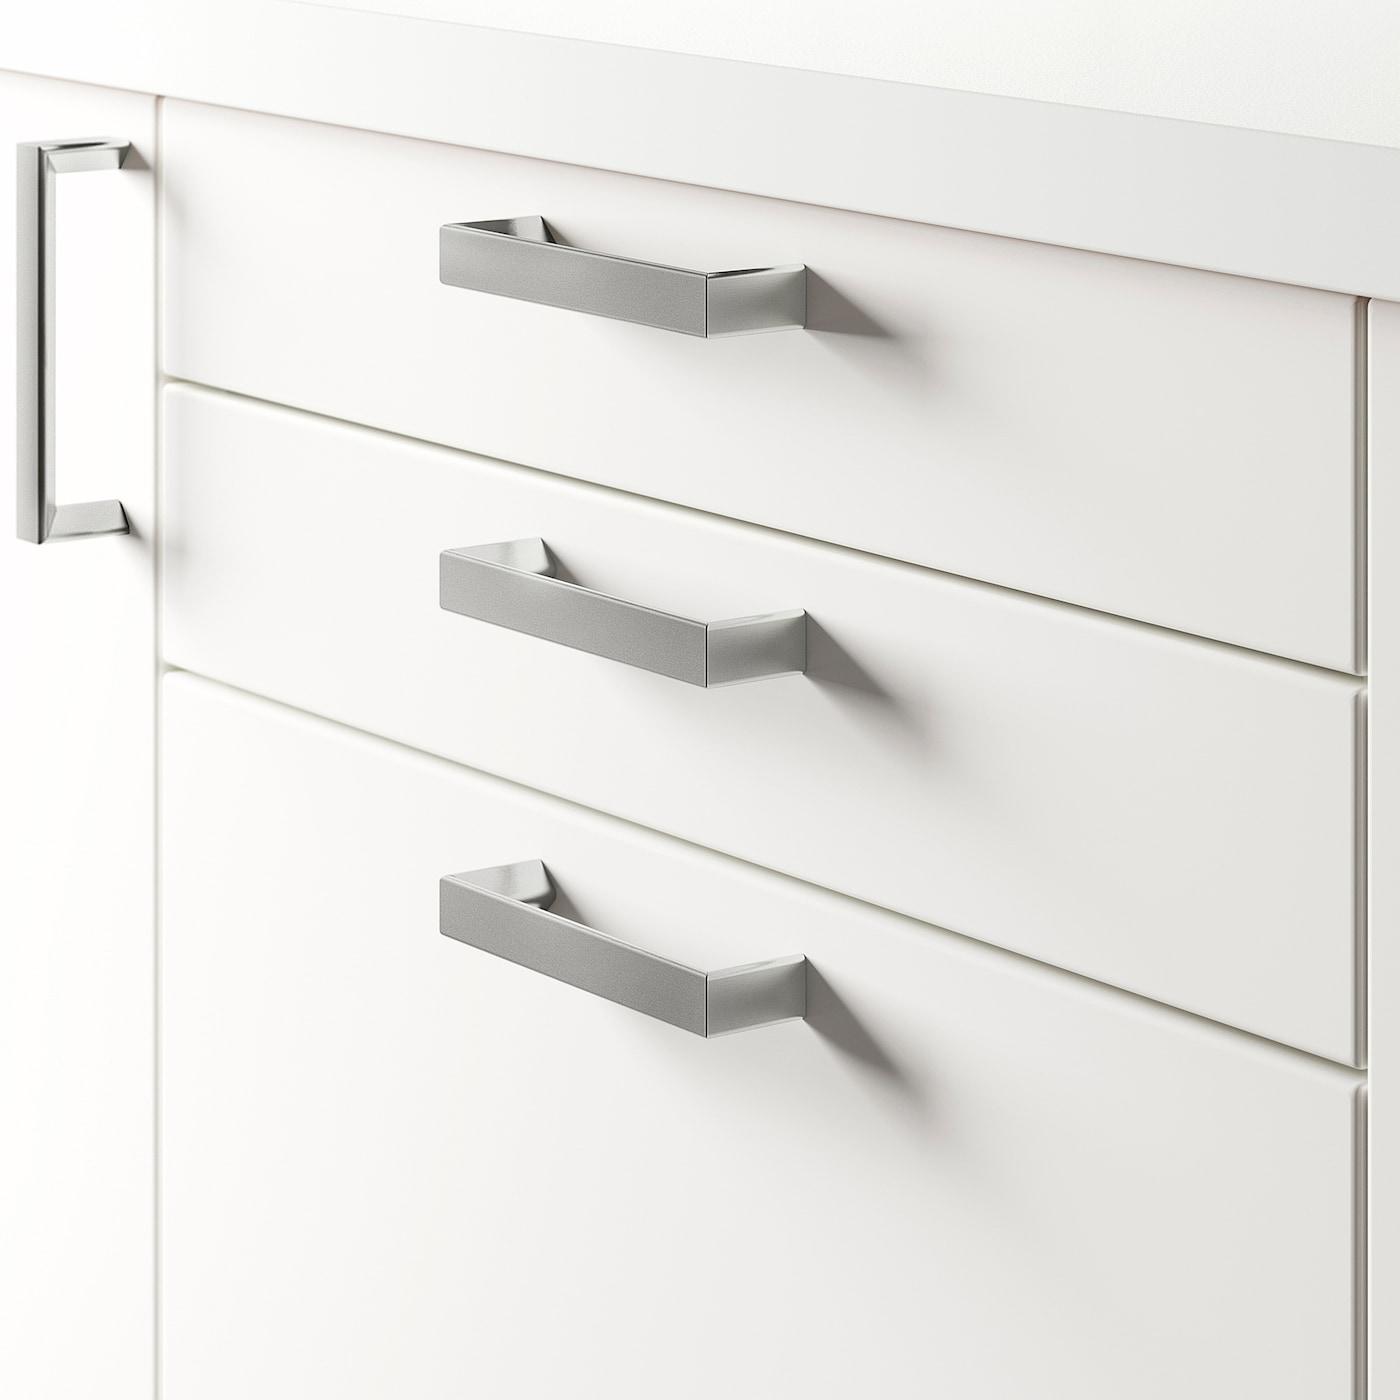 Ikea Handgrepen